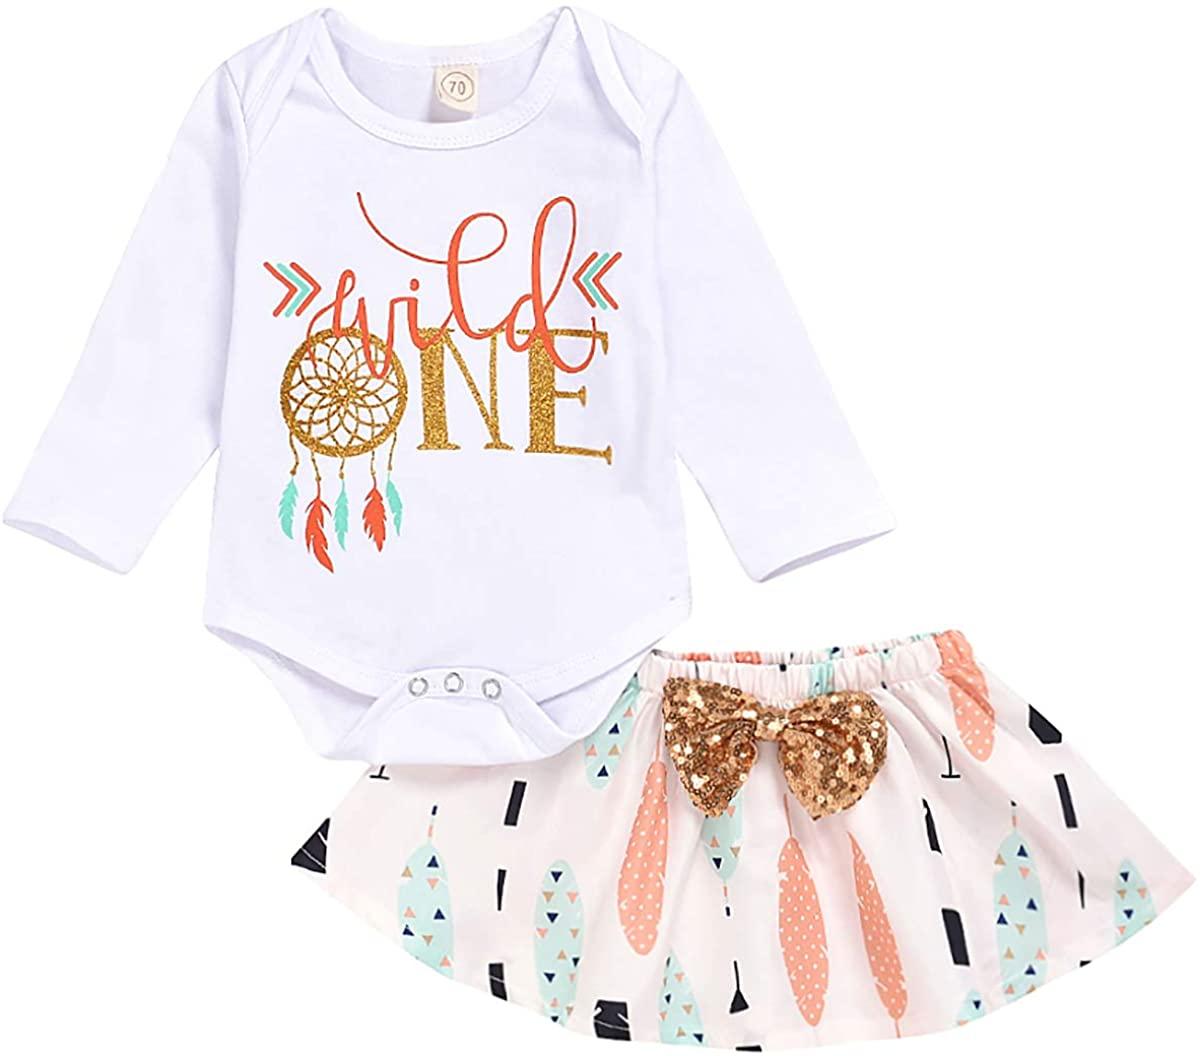 Toddler Baby Girl Outfit Set Summer Infant Romper Tops Floral Strap Skirt Dress Headband Clothes Set